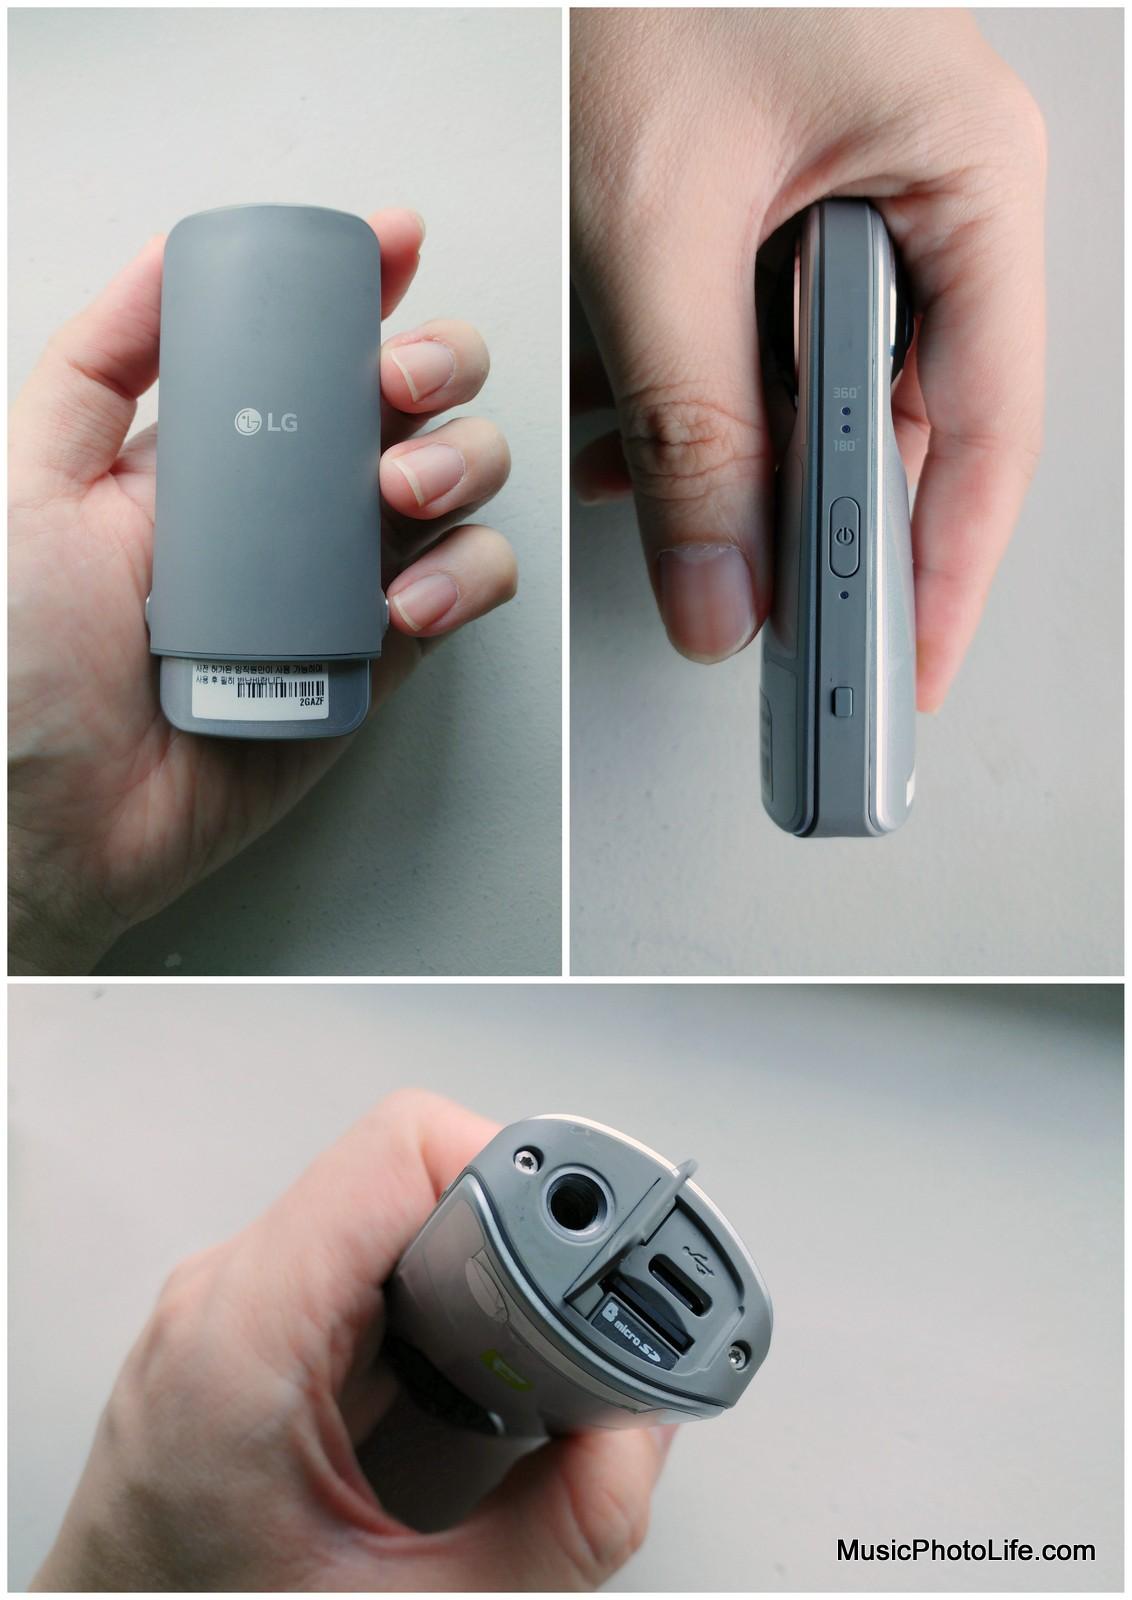 LG360 CAM